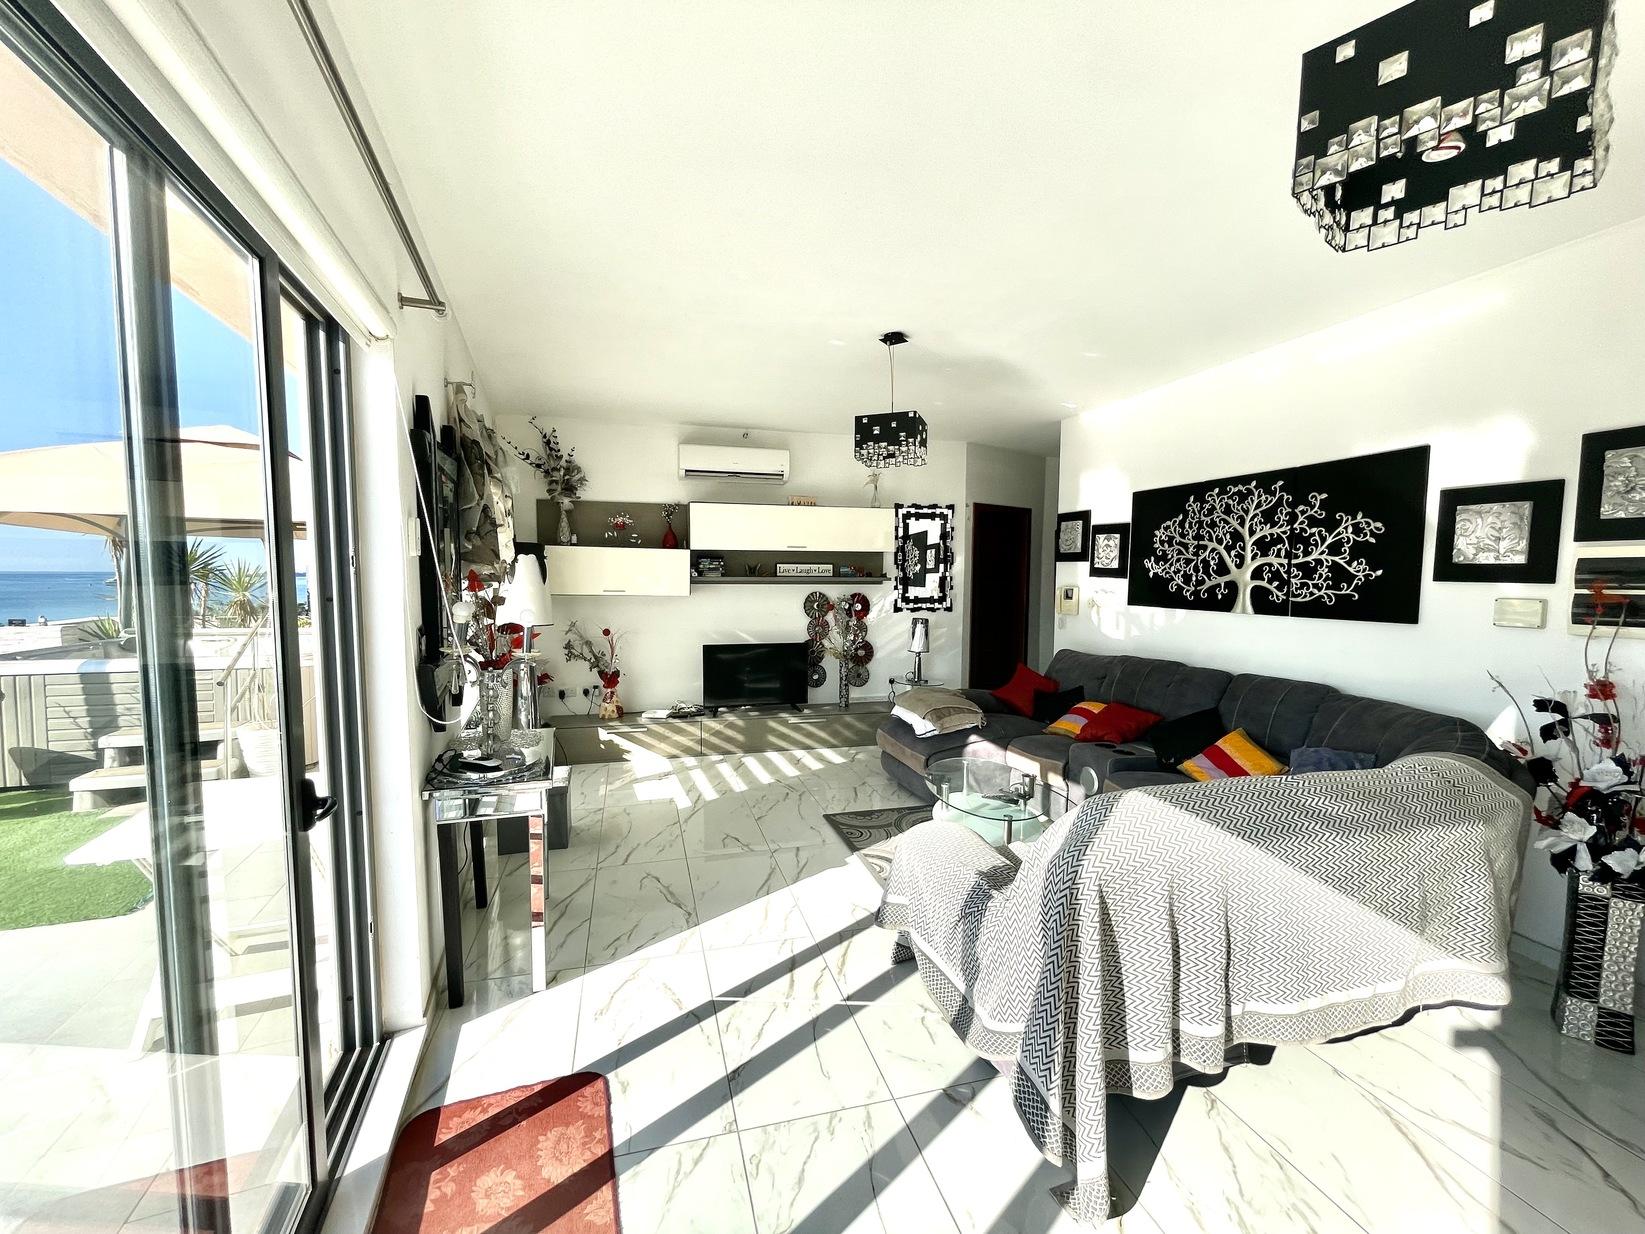 4 bed Penthouse For Rent in Marsaxlokk, Marsaxlokk - thumb 4